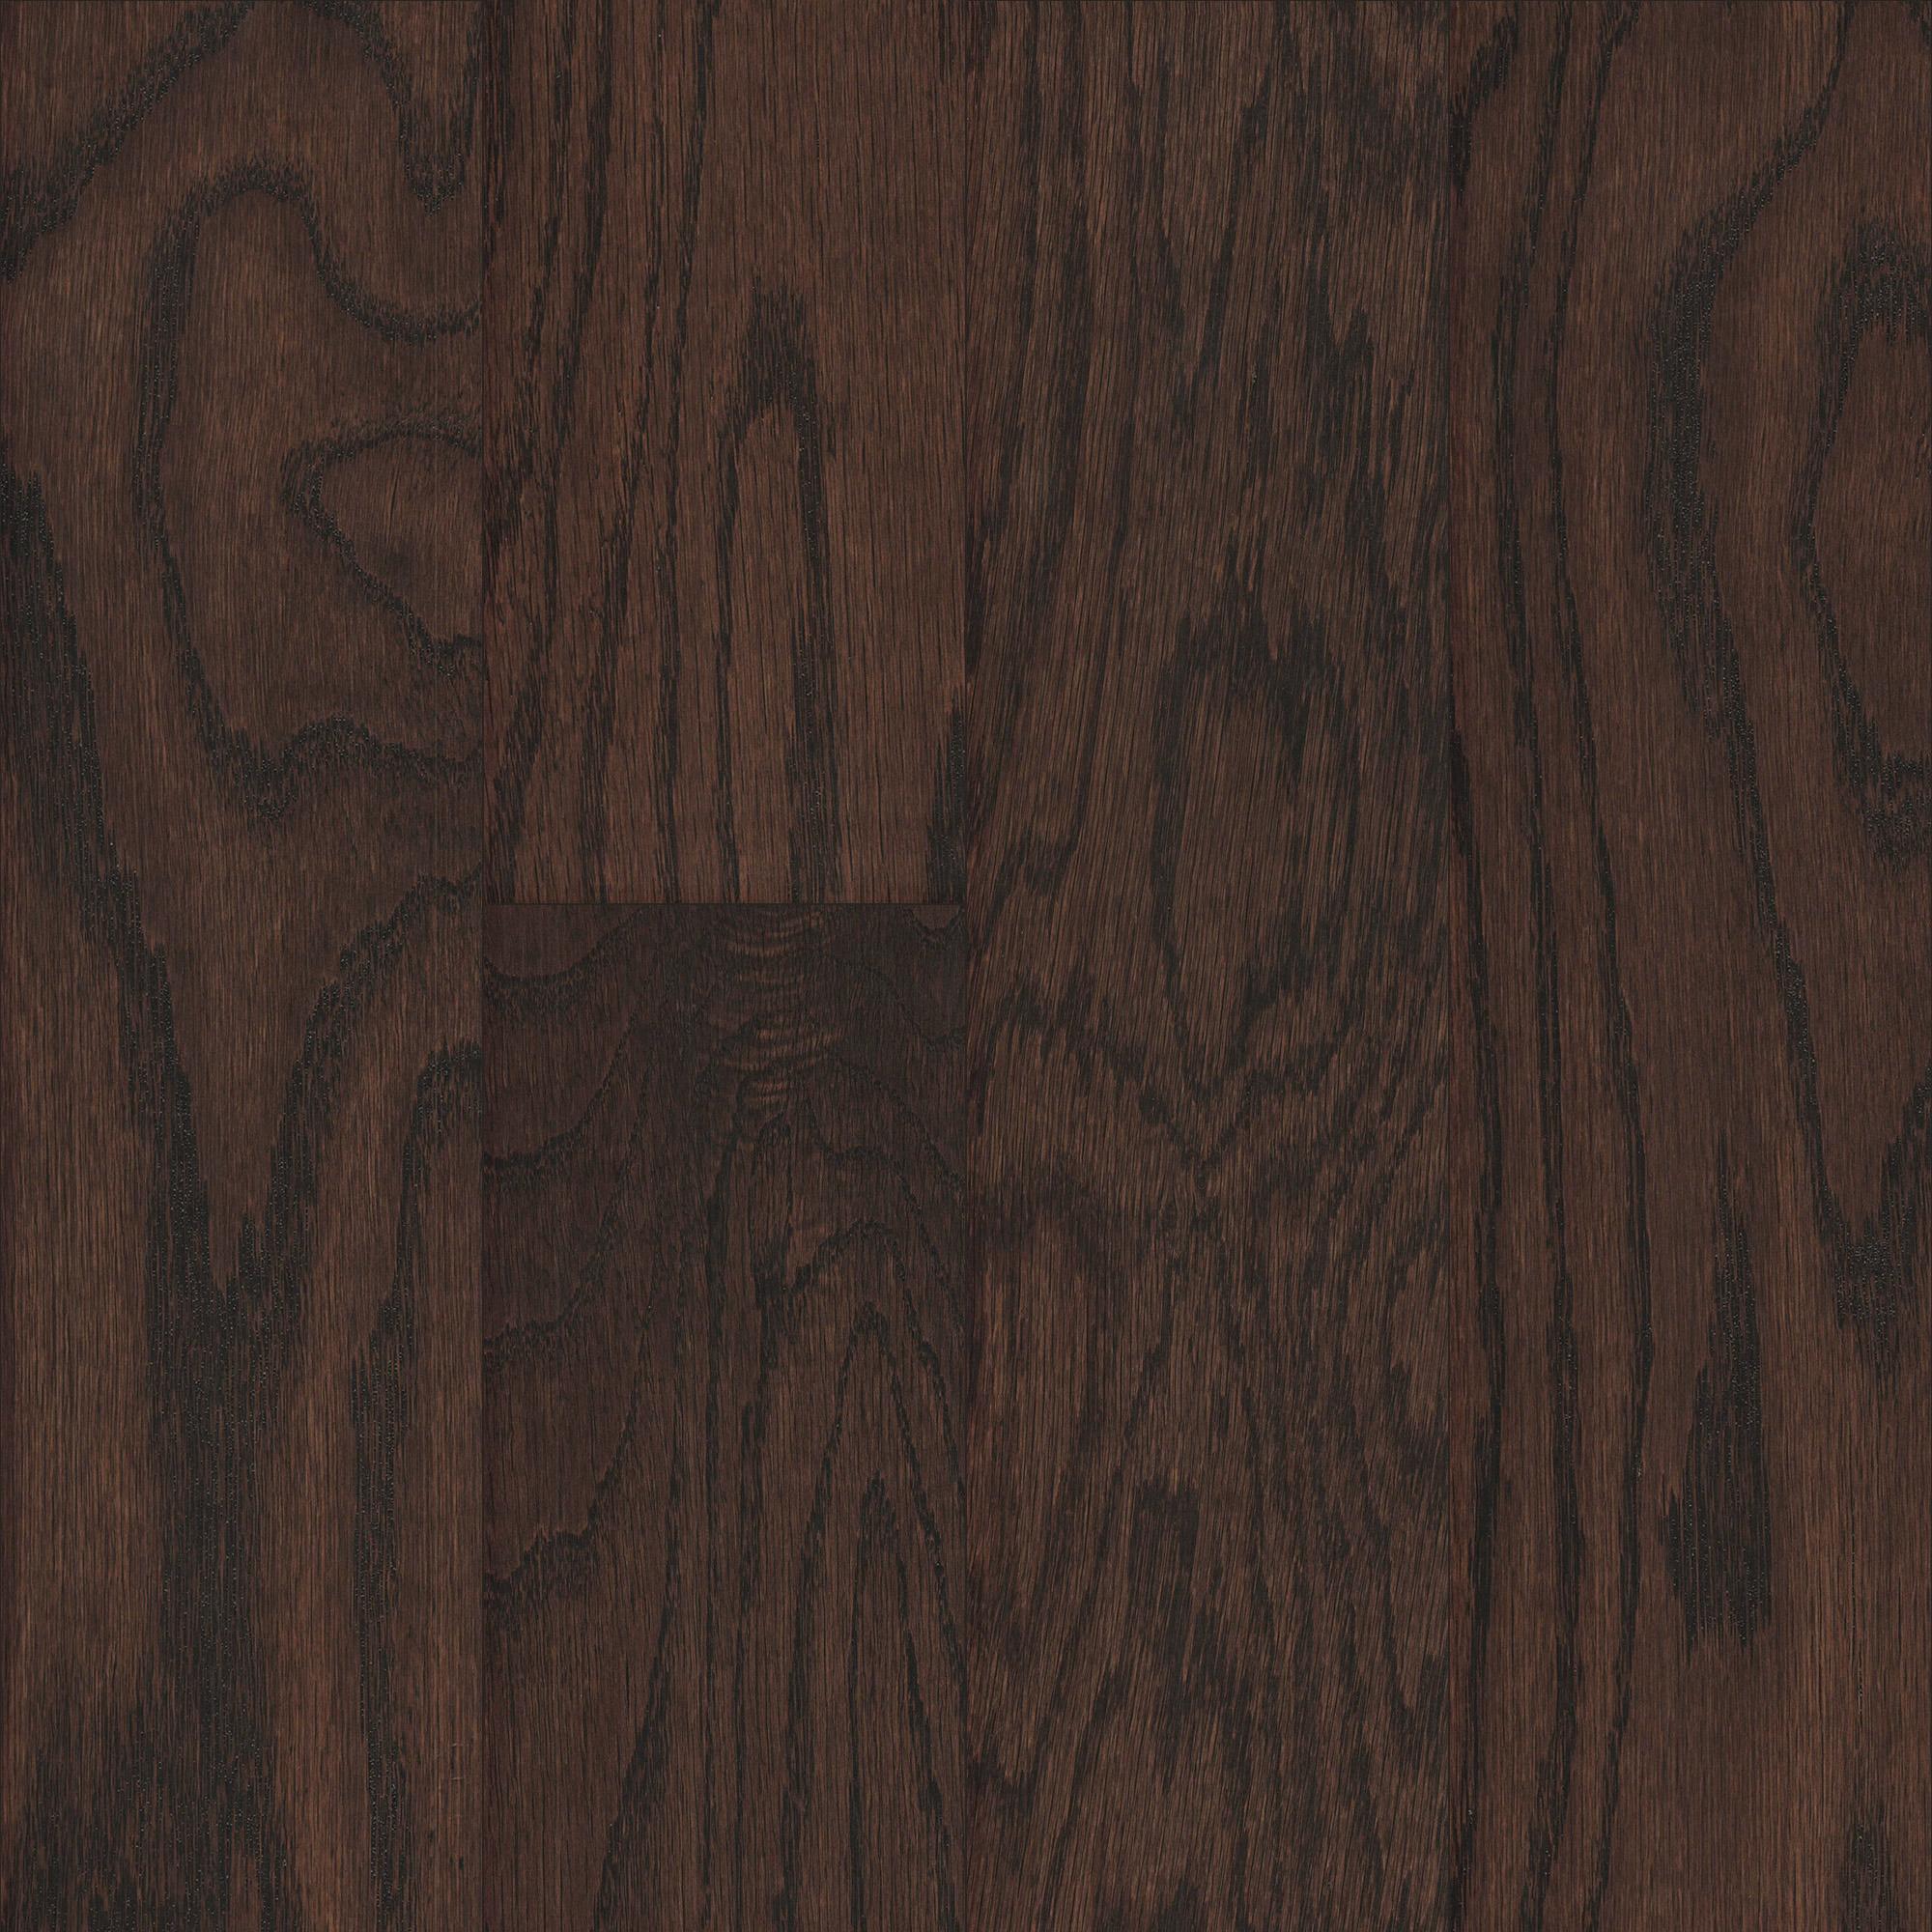 15 Awesome 3 4 Vs 1 2 Inch Engineered Hardwood Flooring 2021 free download 3 4 vs 1 2 inch engineered hardwood flooring of mullican ridgecrest oak burnt umber 1 2 thick 5 wide engineered within mullican ridgecrest oak burnt umber 1 2 thick 5 wide engineered hardwoo